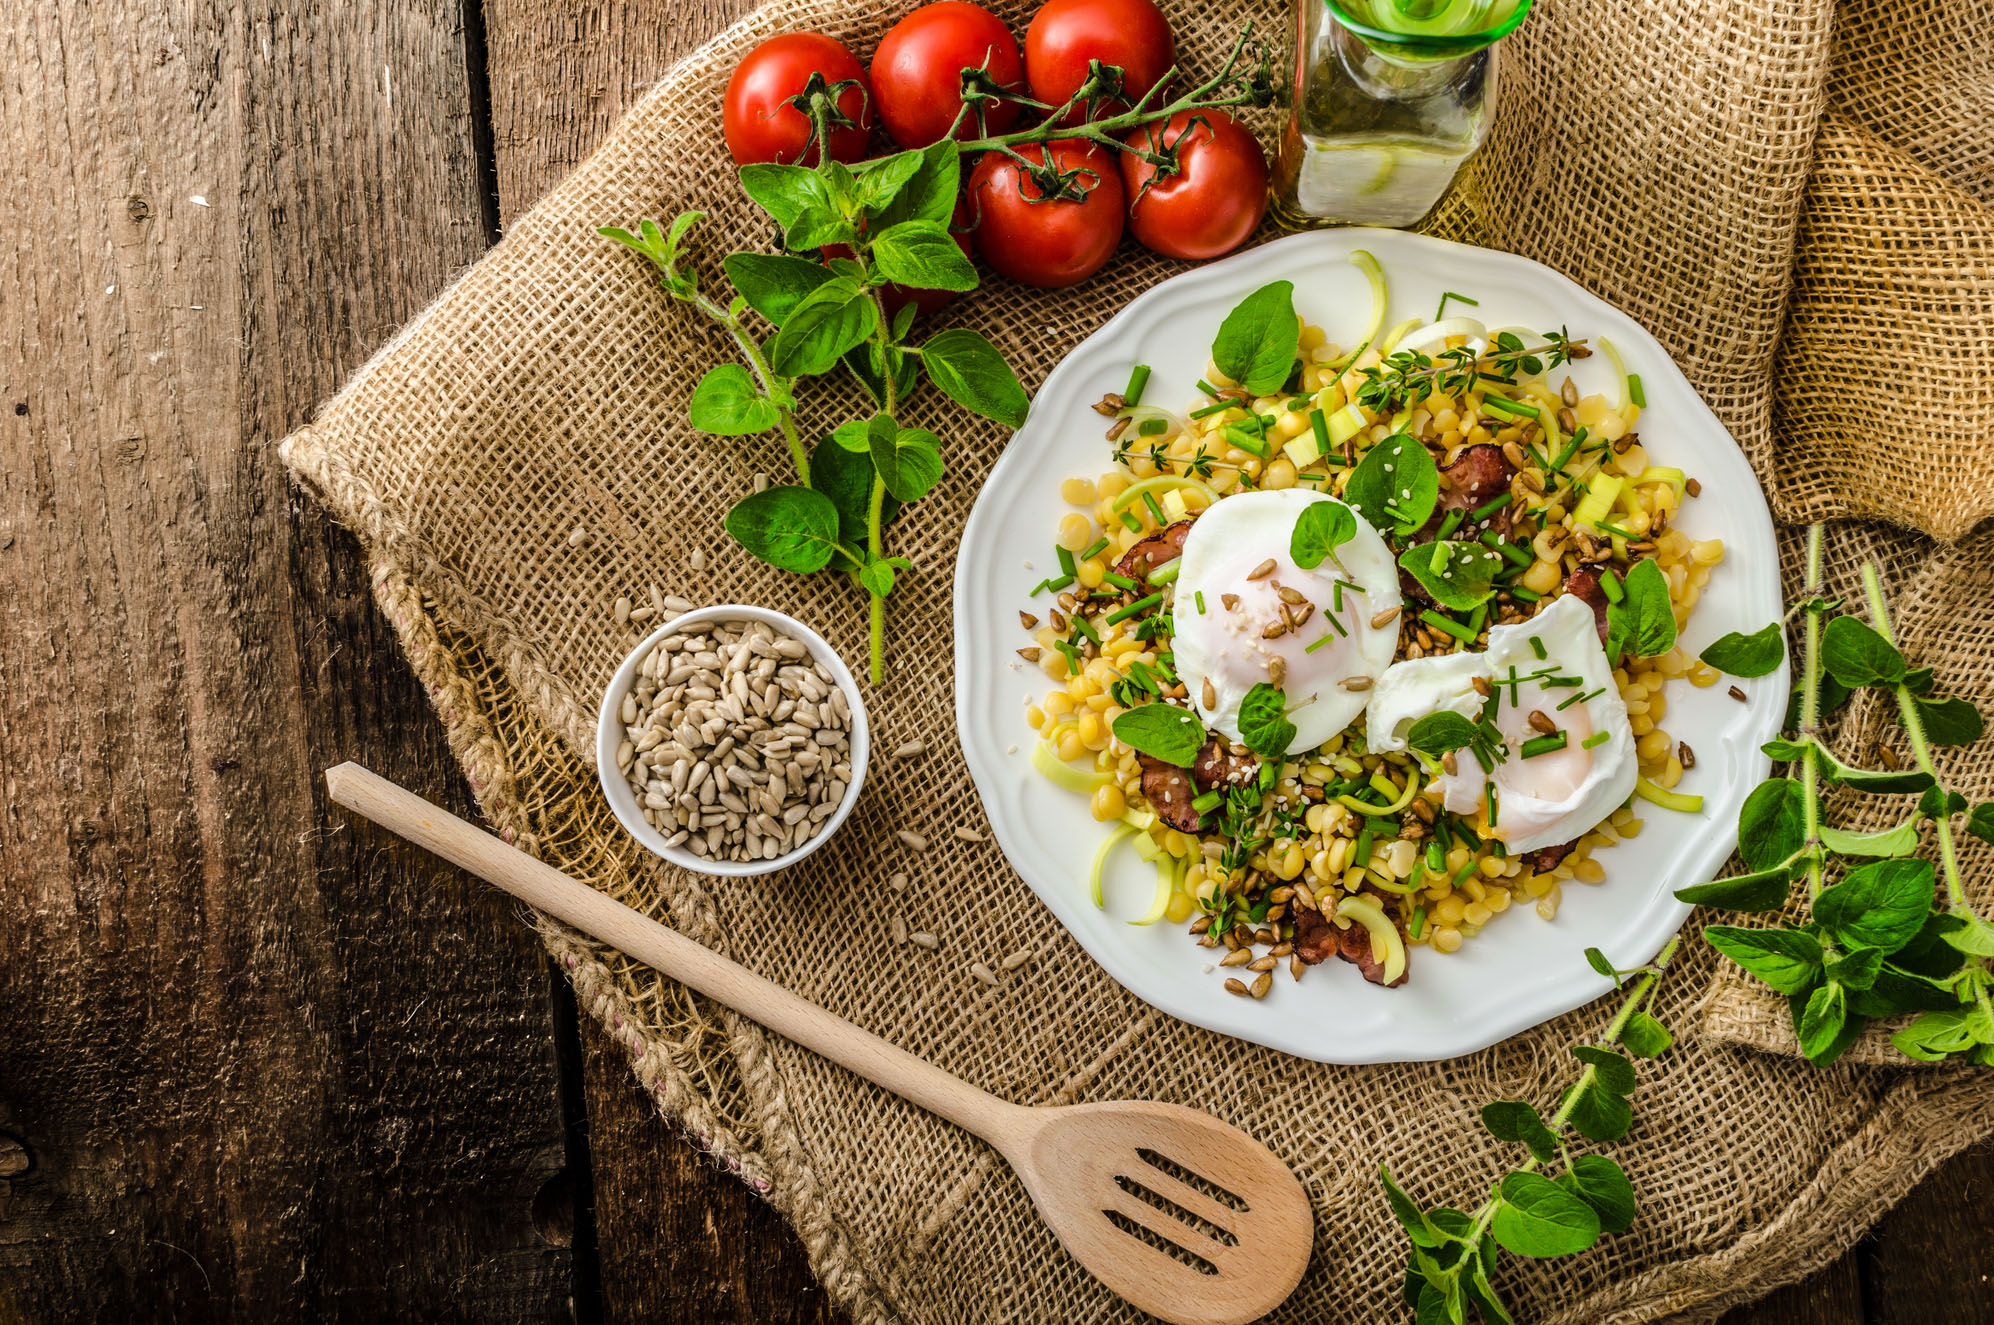 16-19 novembre debutta FoodNova: la kermesse dedicata ai nuovi trend alimentari